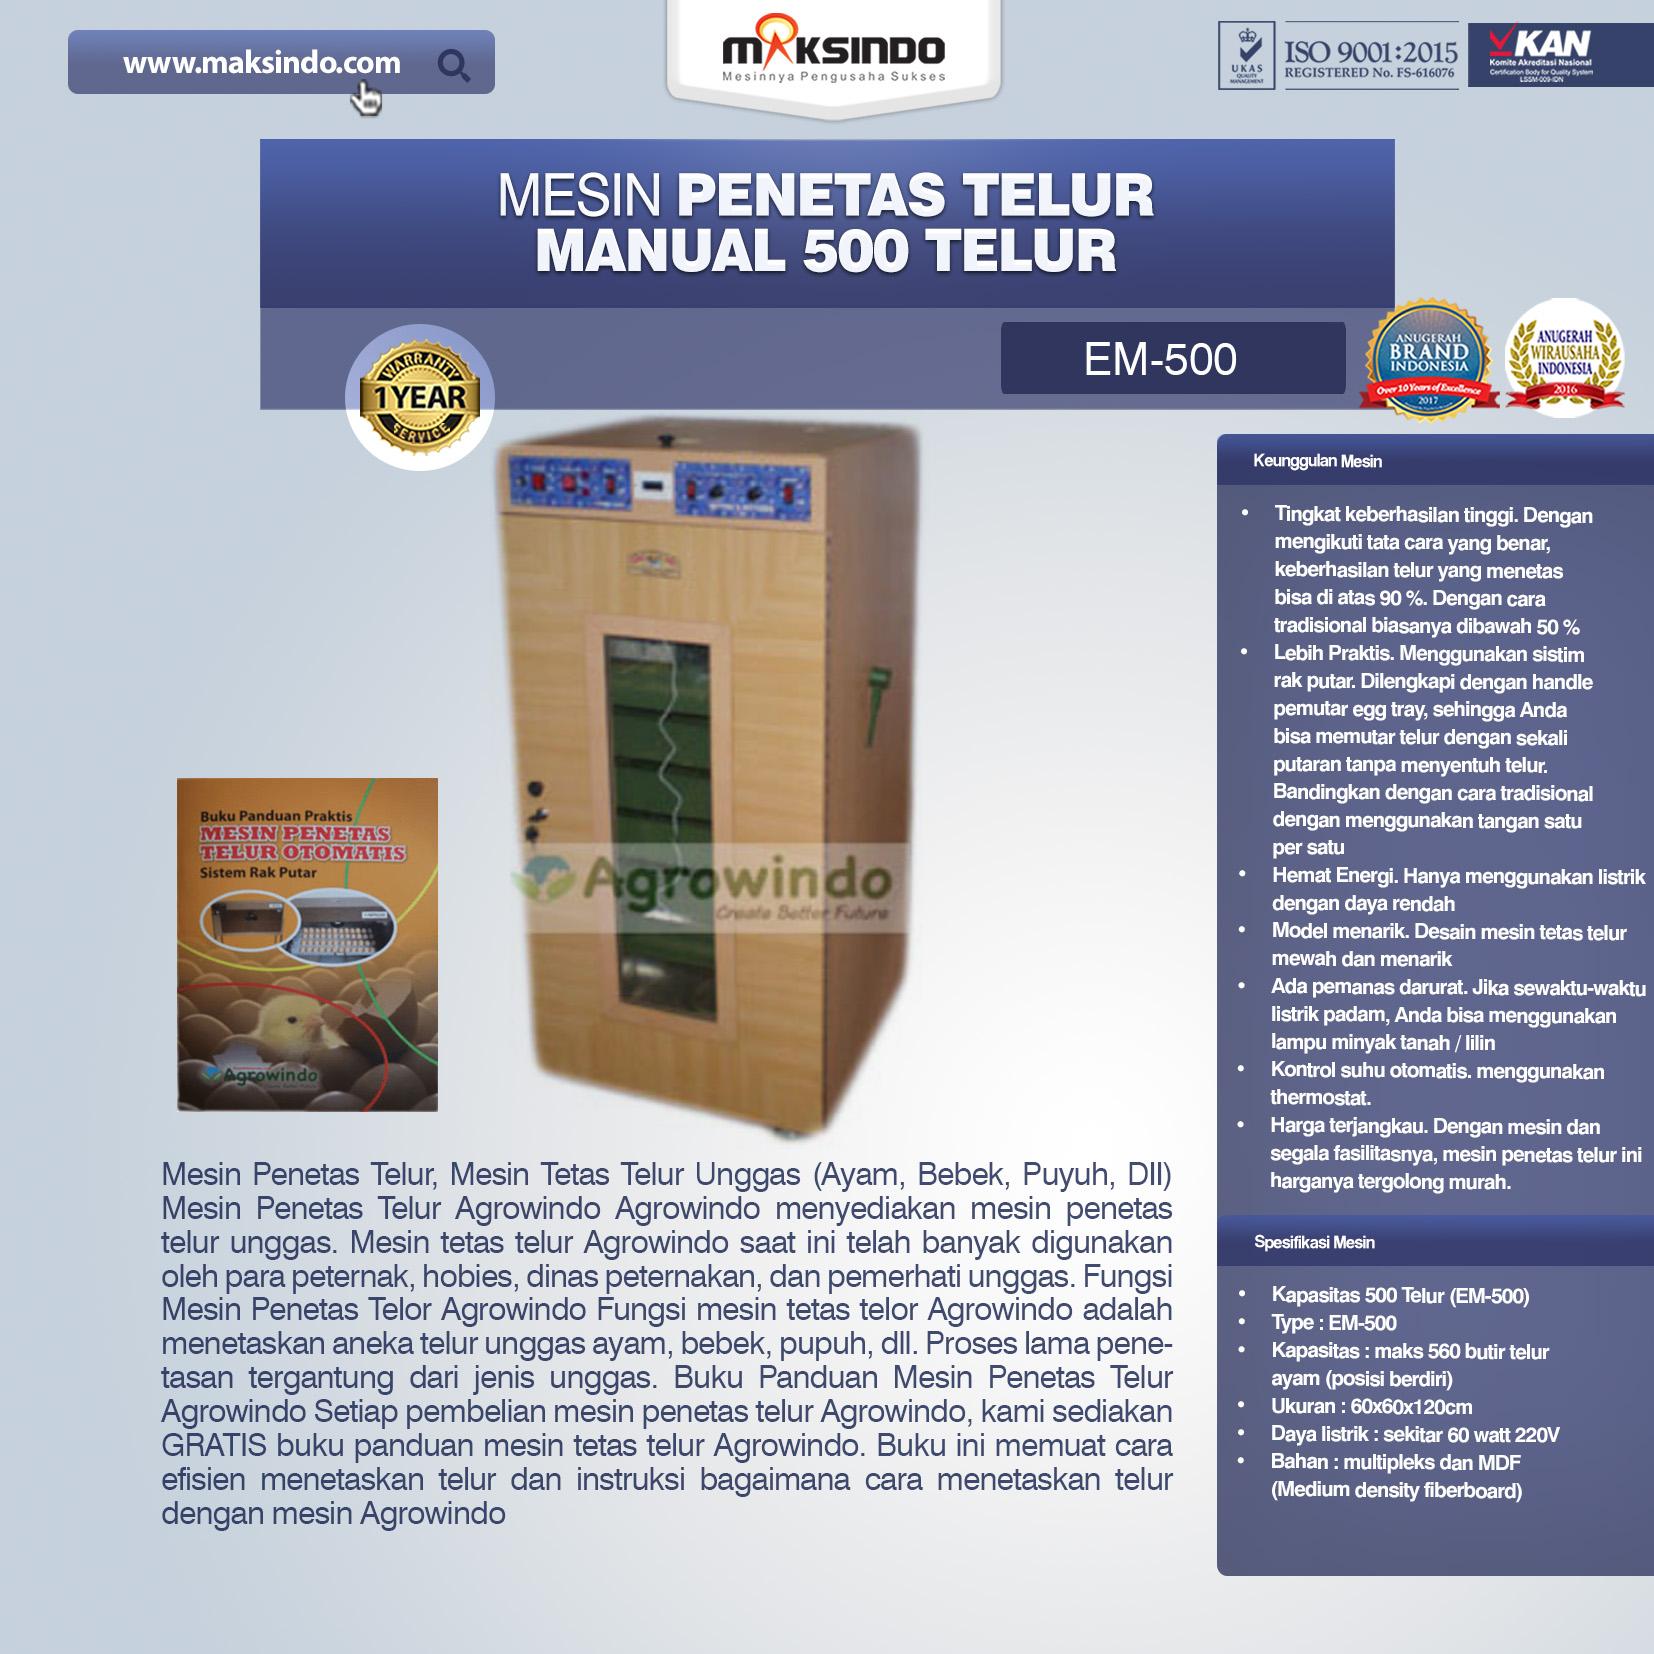 Jual Mesin Penetas Telur Manual 500 Telur (EM-500) di Medan